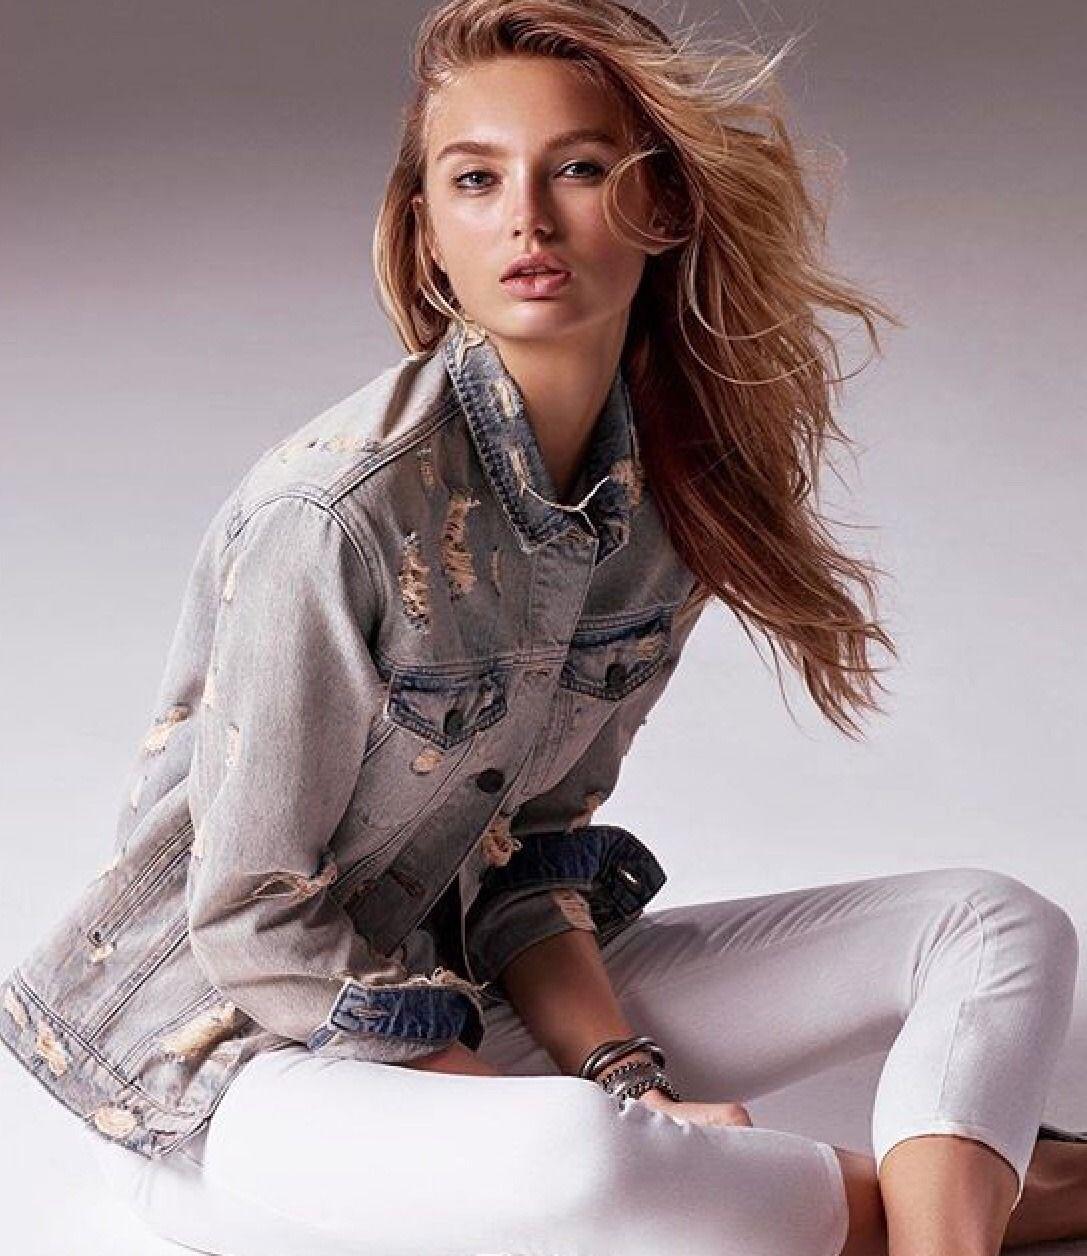 df6db90497b153 Romee Strijd || Mavi Jeans (2018 Campaign) | Romee | Fashion, Mavis ...